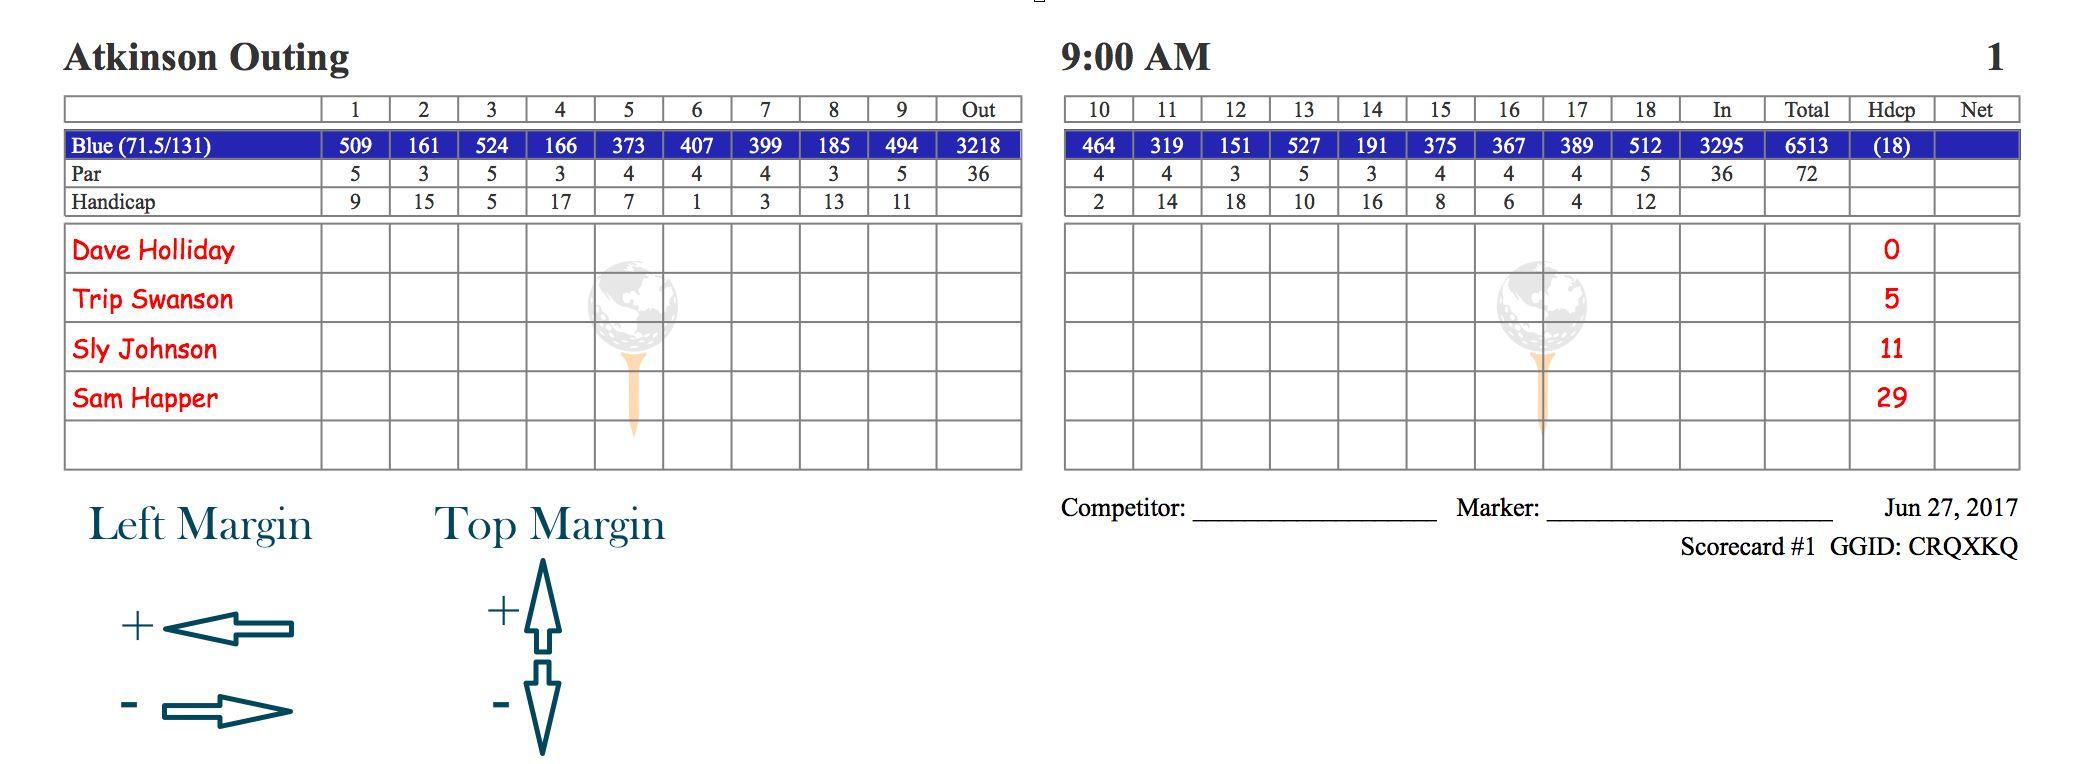 Golfgenius Printing Scorecards Format Tab Inside Golf Score Cards Template Cumed Org Golf Score Card Template Templates